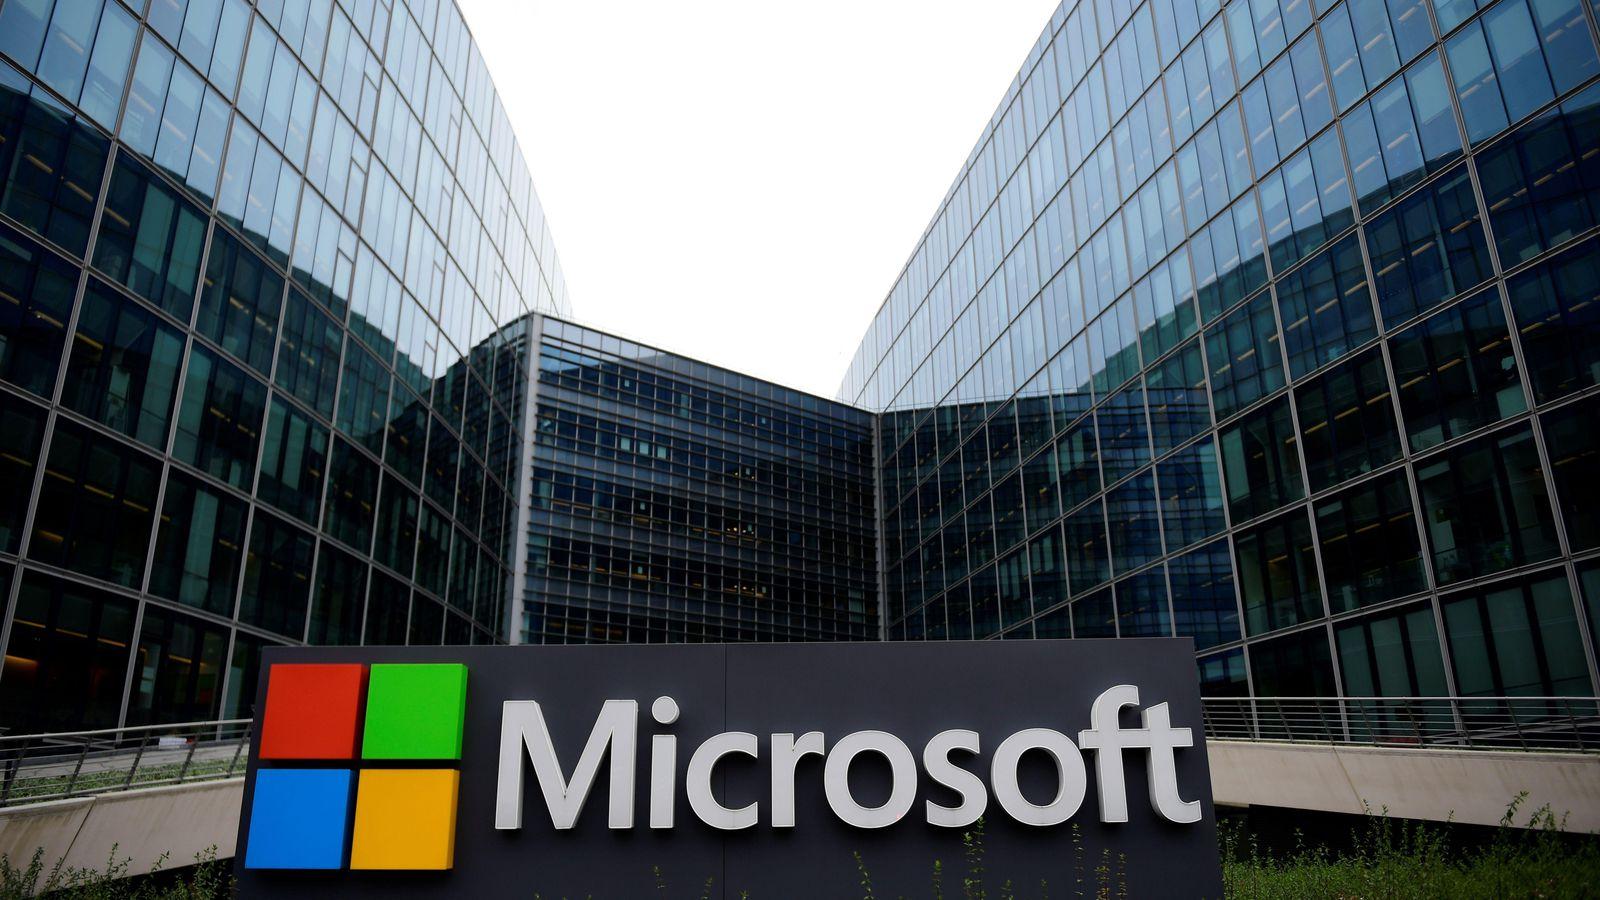 Microsoft lanza un nuevo producto con Blockchain de Etherum